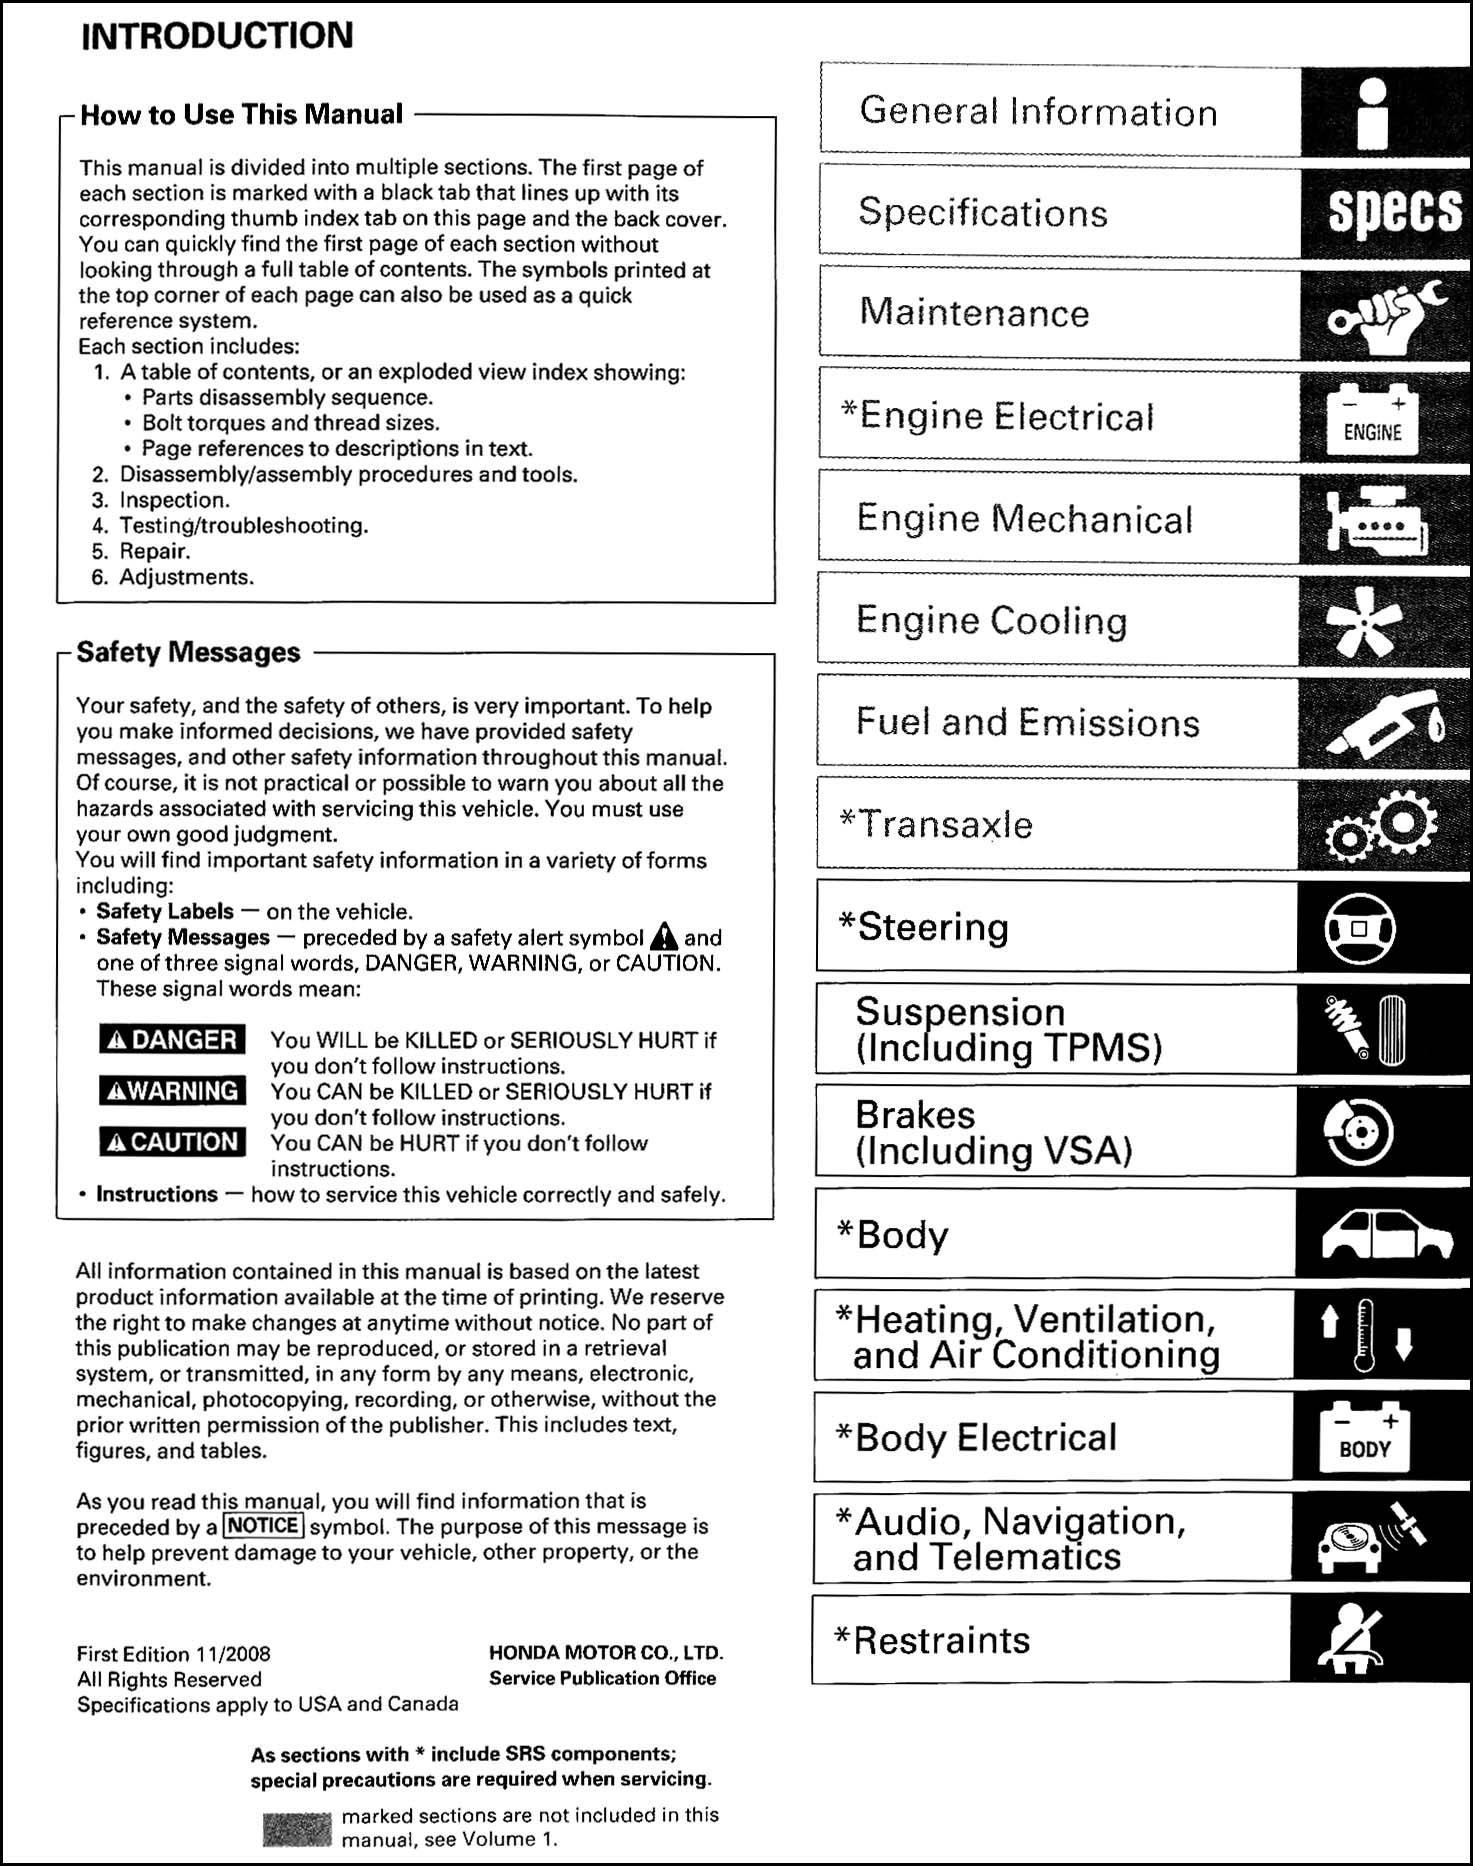 1988 honda accord maintenance manual best setting instruction guide u2022 rh ourk9 co honda accord service manual 2008 honda accord sedan 2008 owners manual